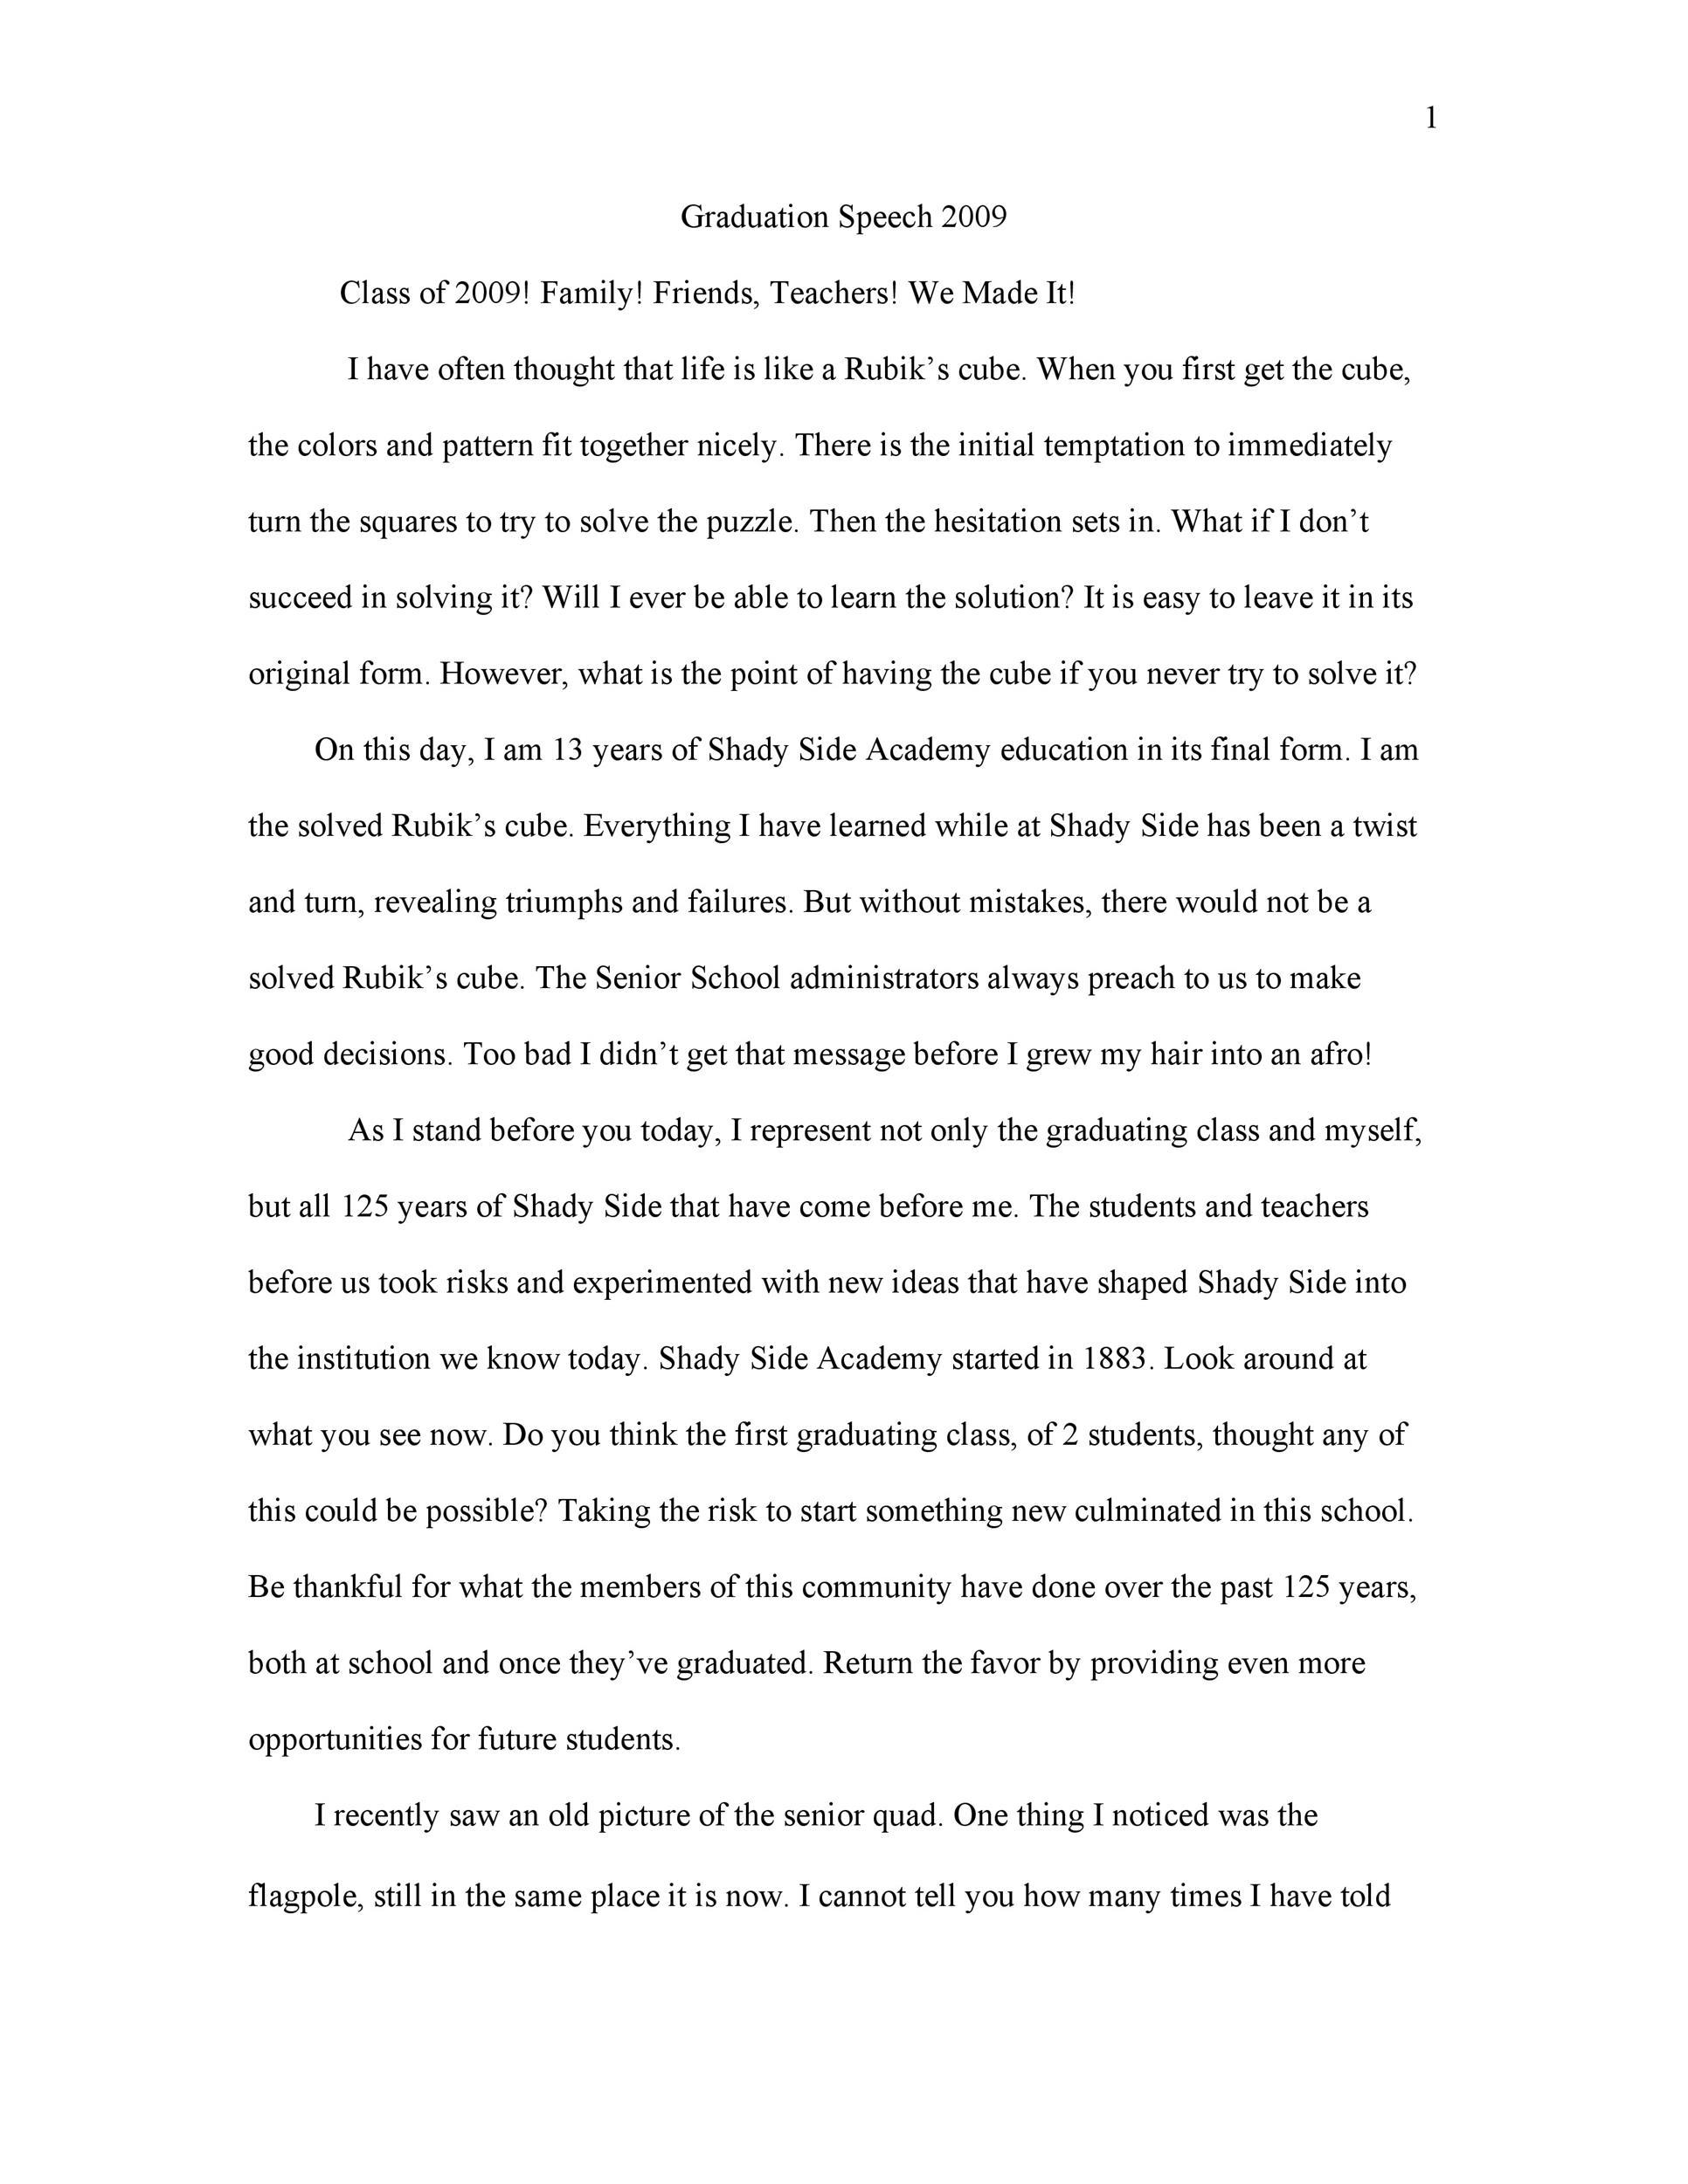 Free graduation speech example 49